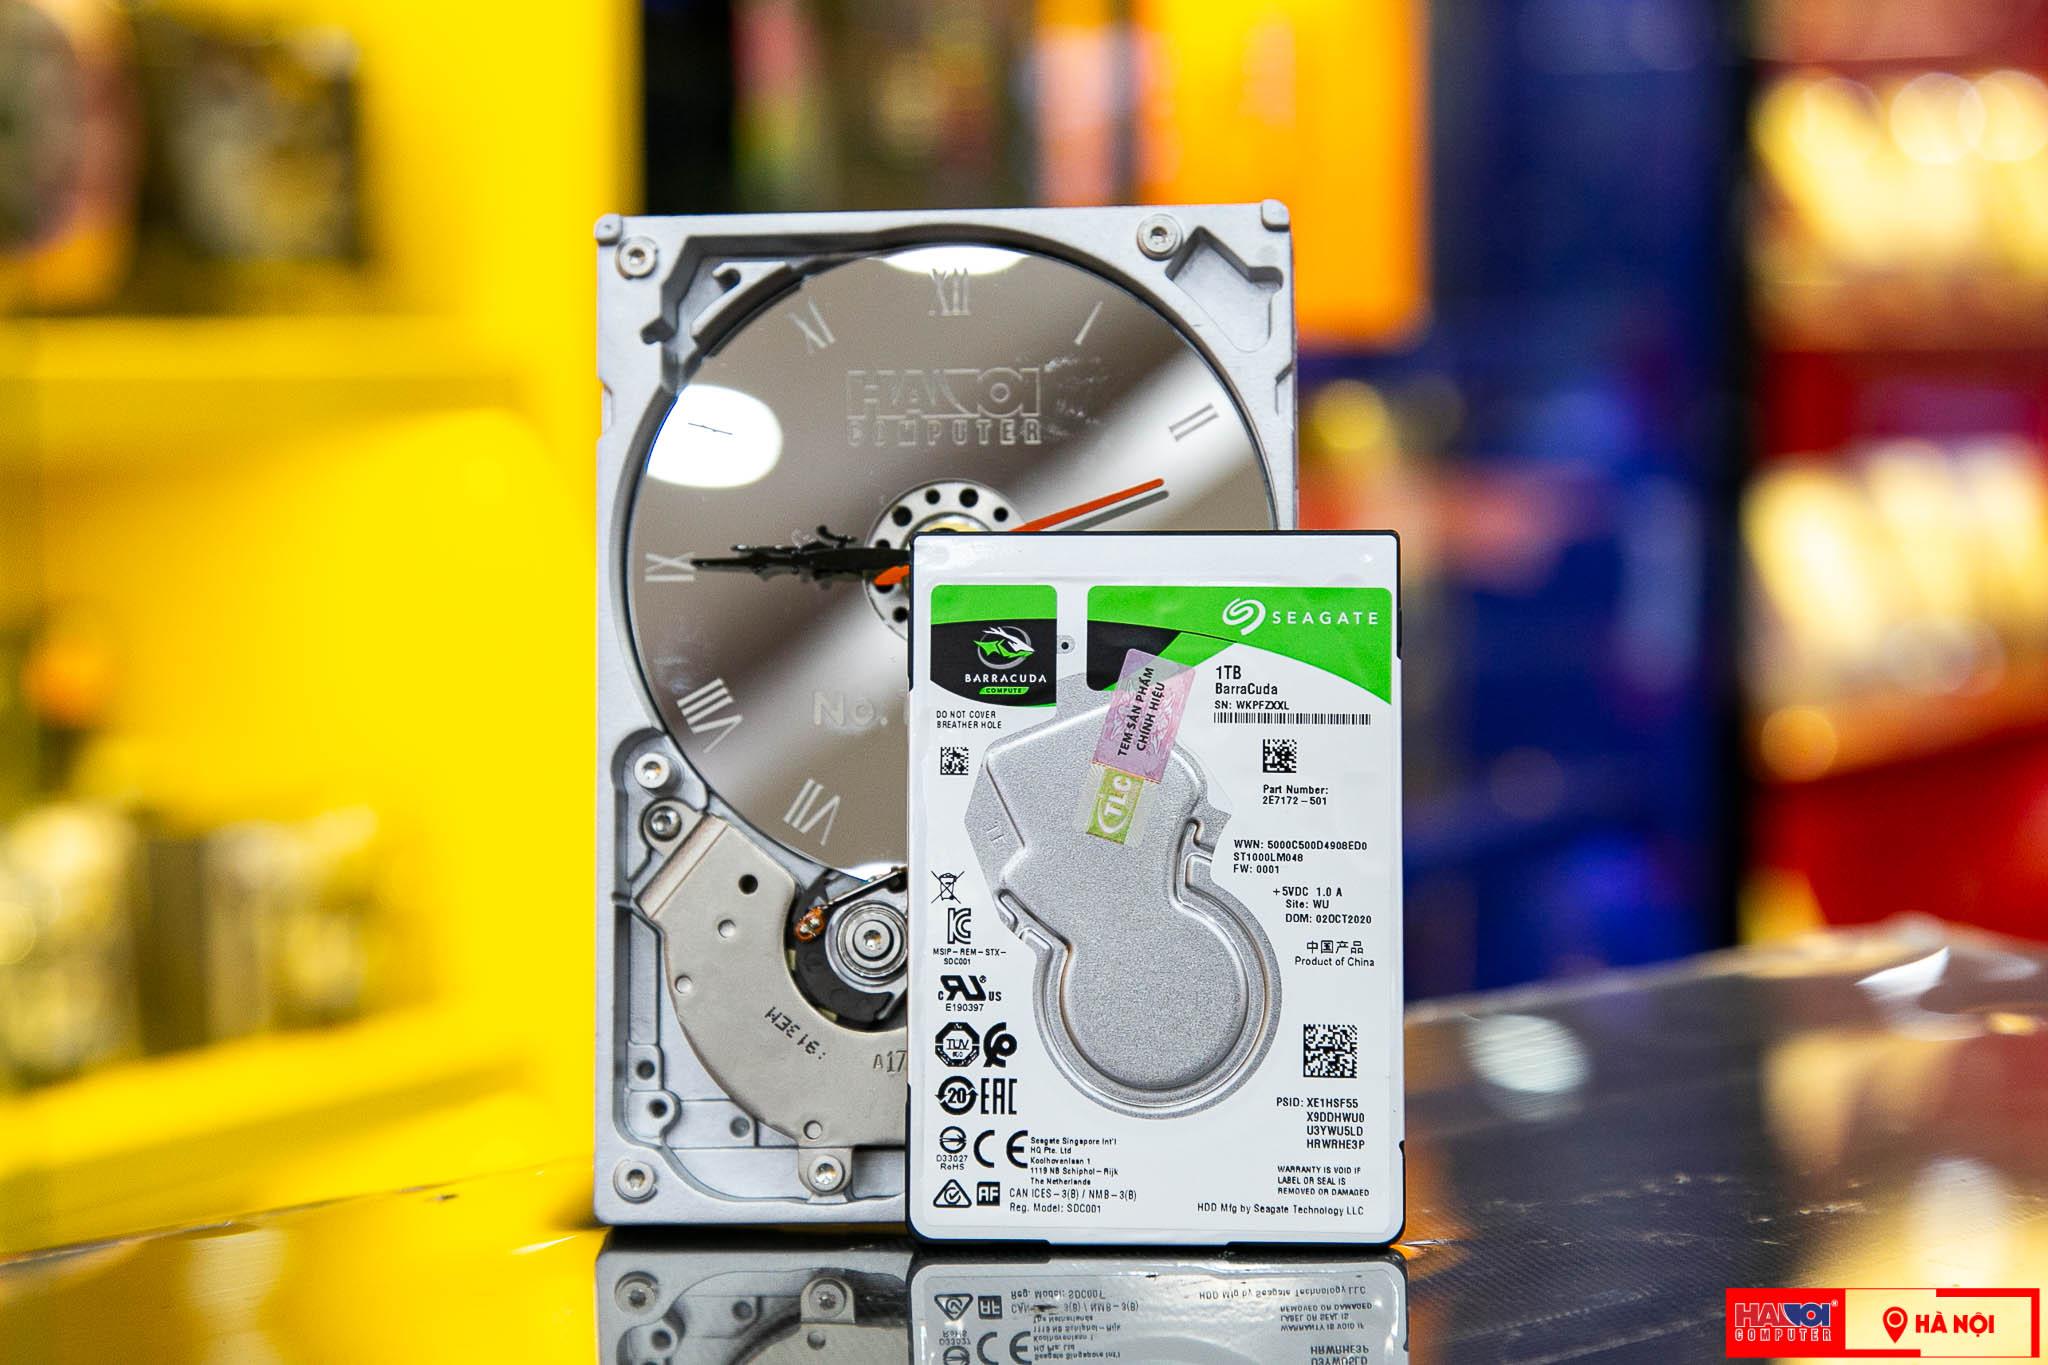 Ổ cứng HDD Laptop Seagate Barracuda 1TB 2.5 Inch, 5400RPM SATA3 6GB/s, 128MB Cache